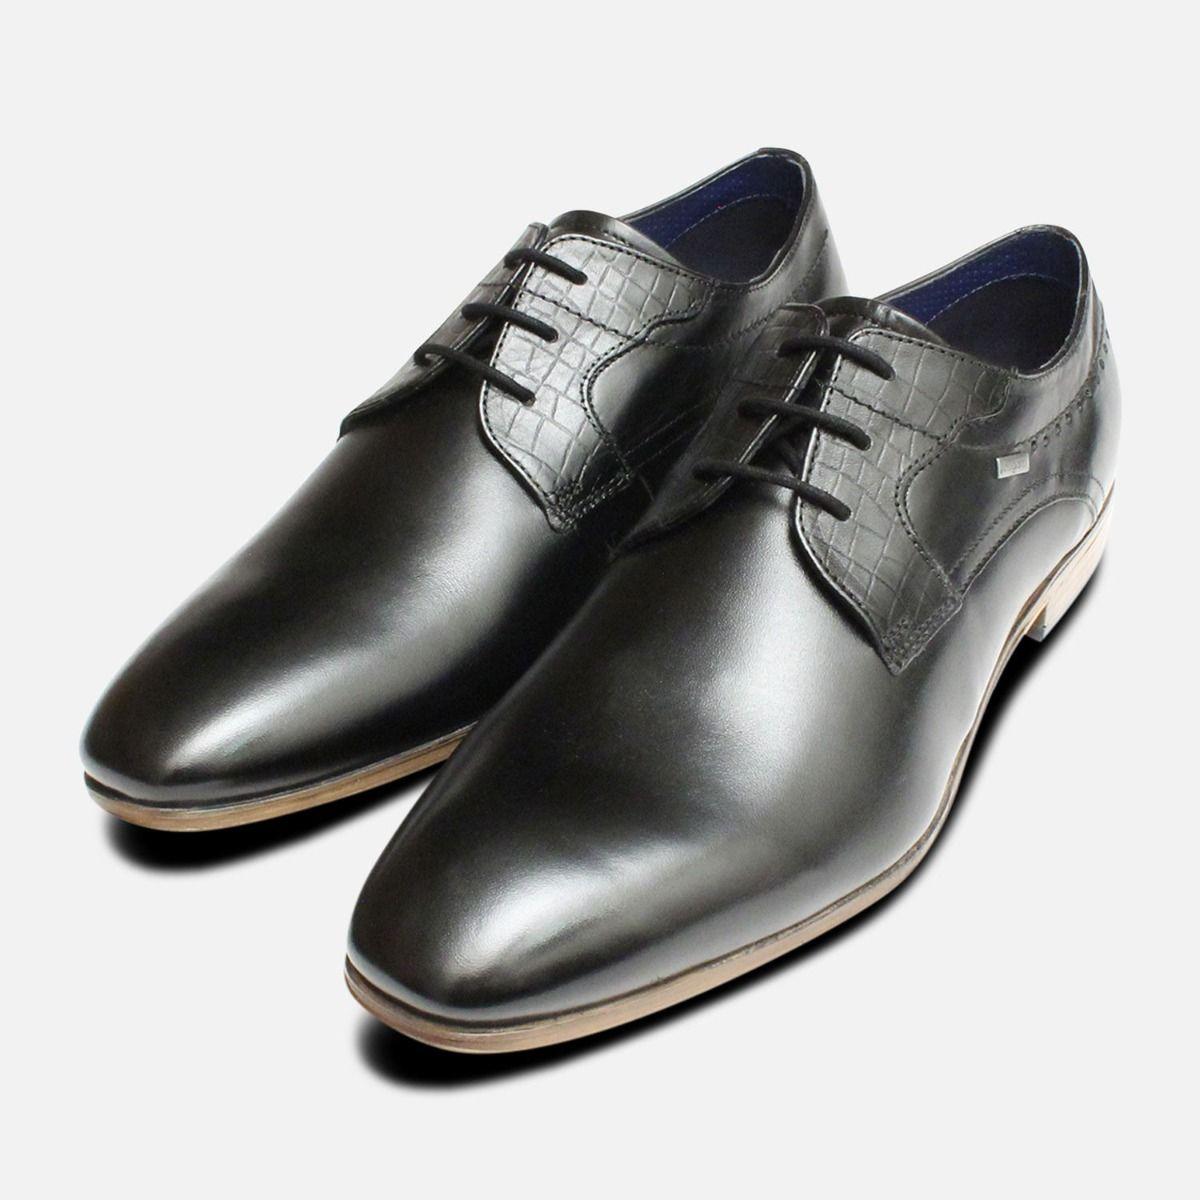 6233665152ef0 Formal Black Leather Dress Shoes by Bugatti